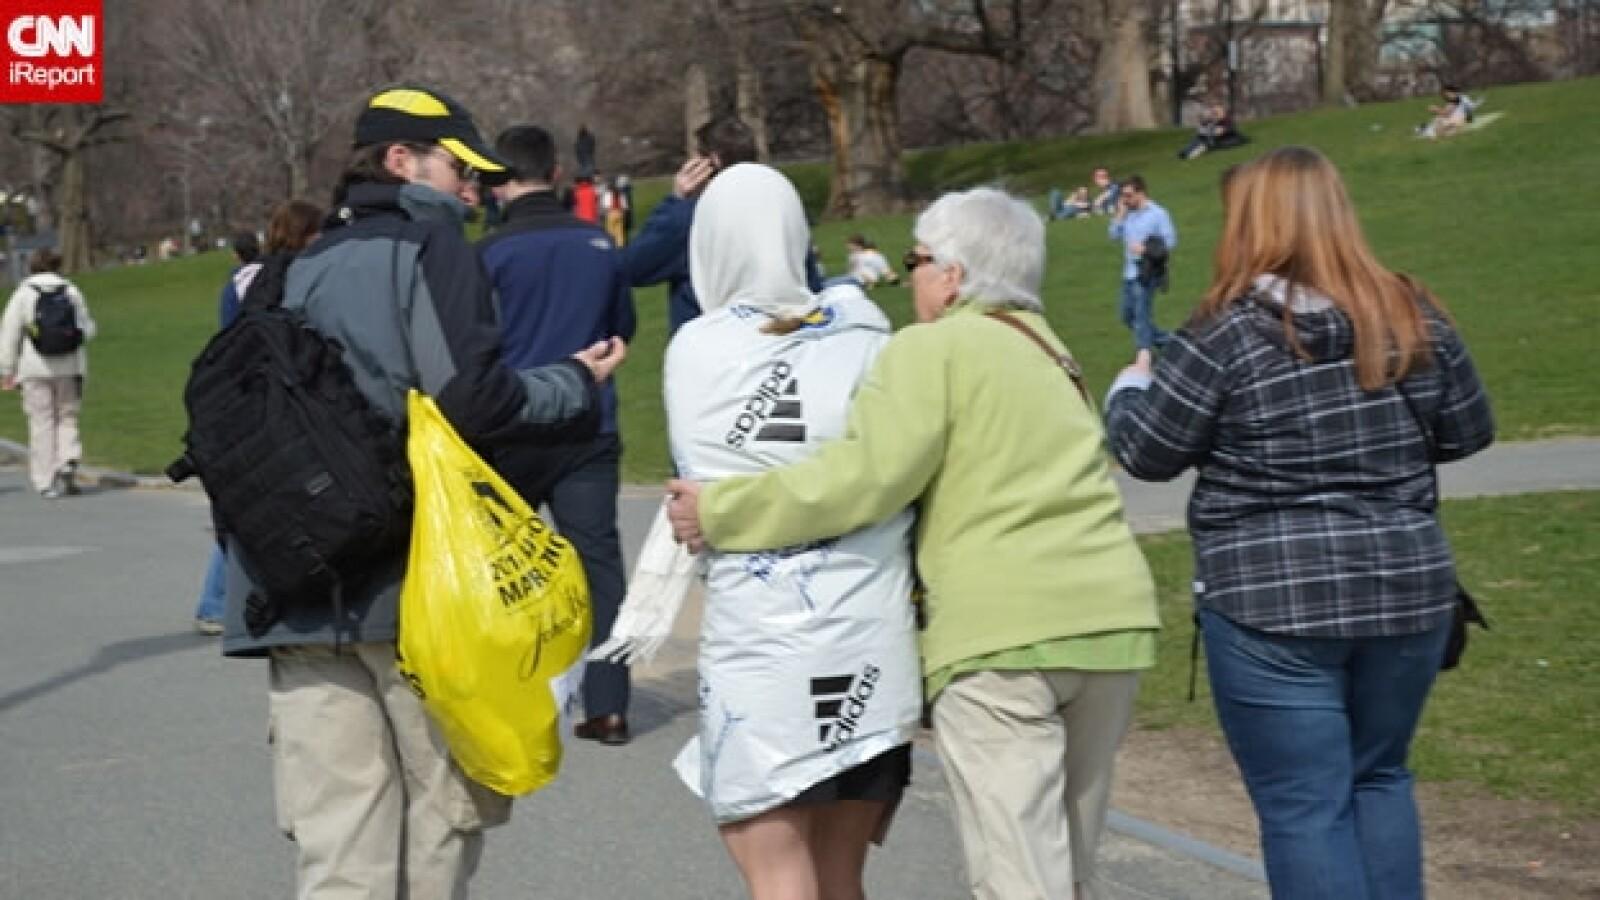 Maratón de Boston ataque iReport 06